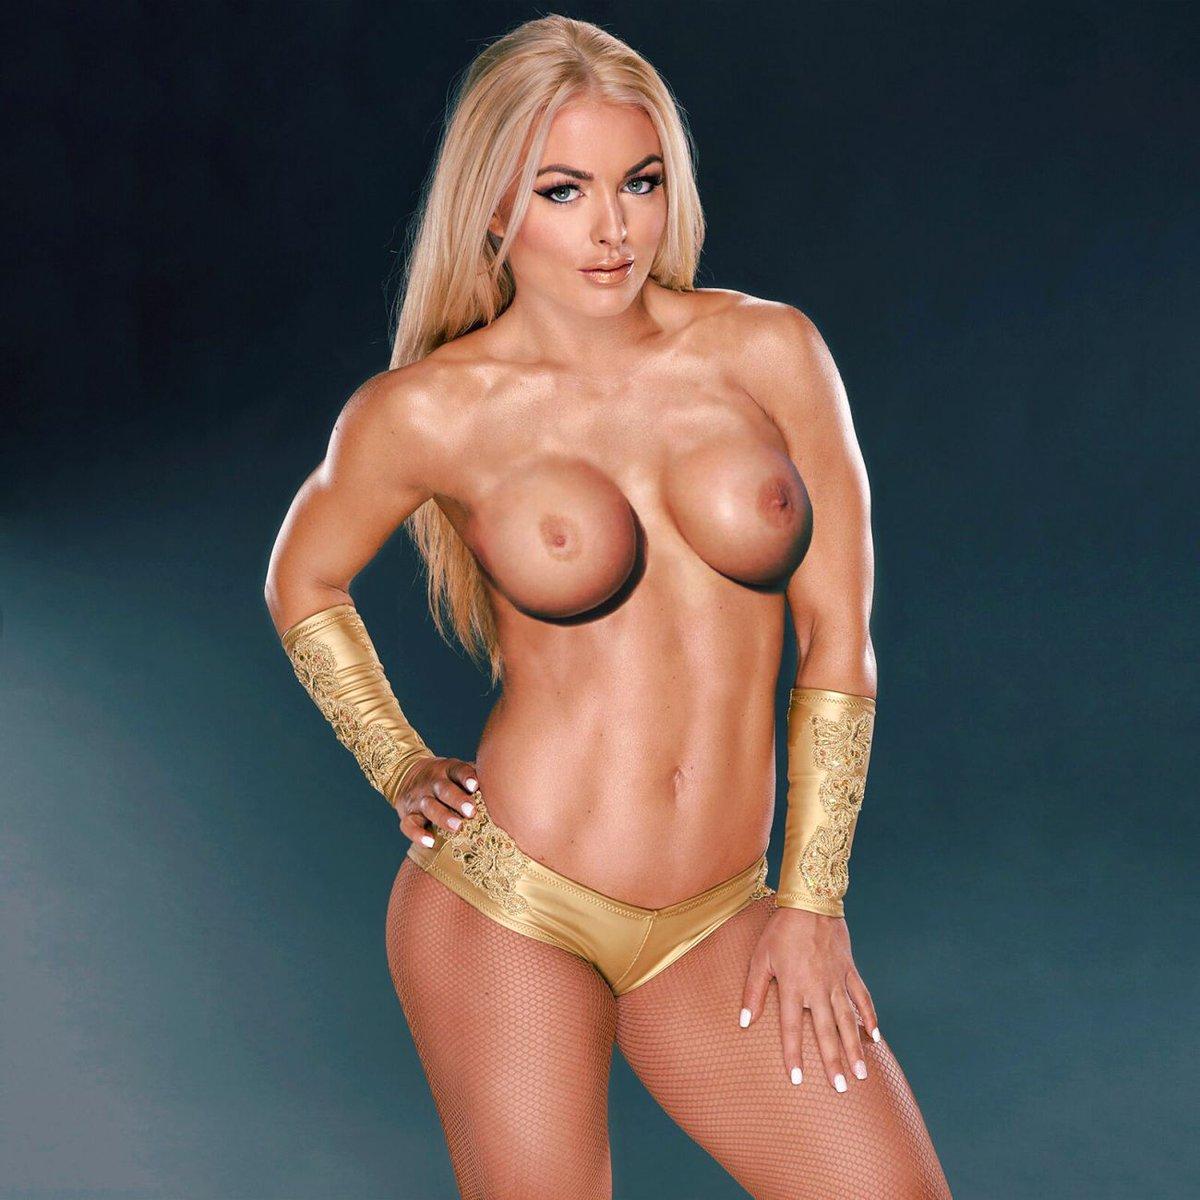 Wwe natalya nude porn pics